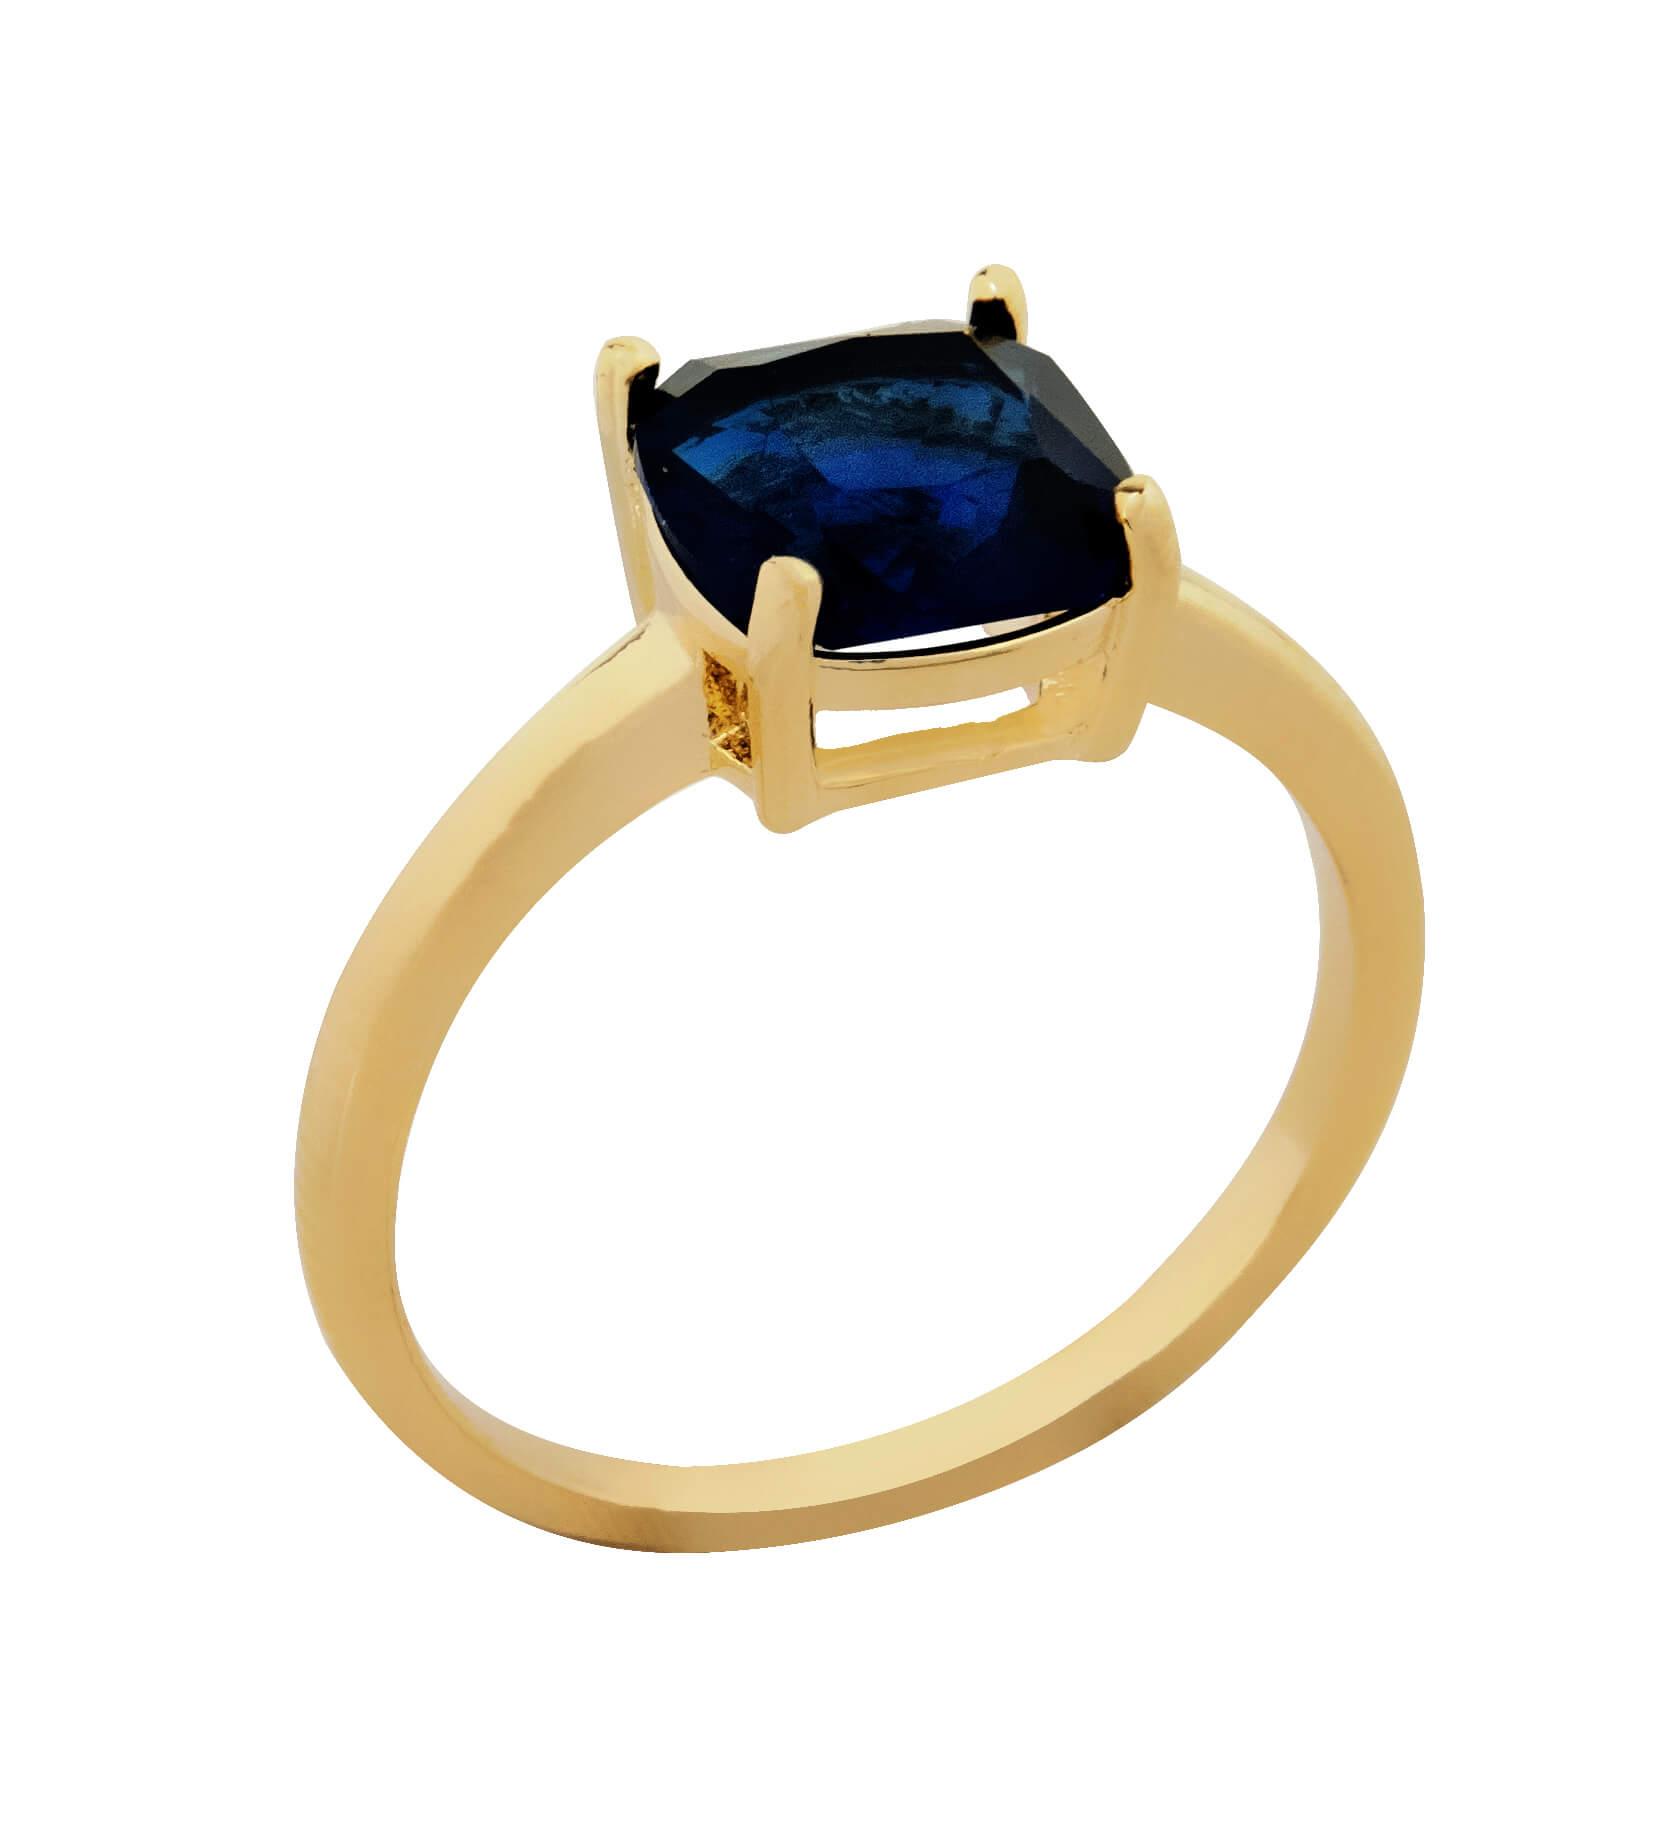 Anel Pedra De Vidro Safira Azul Banhado  a Ouro 18k